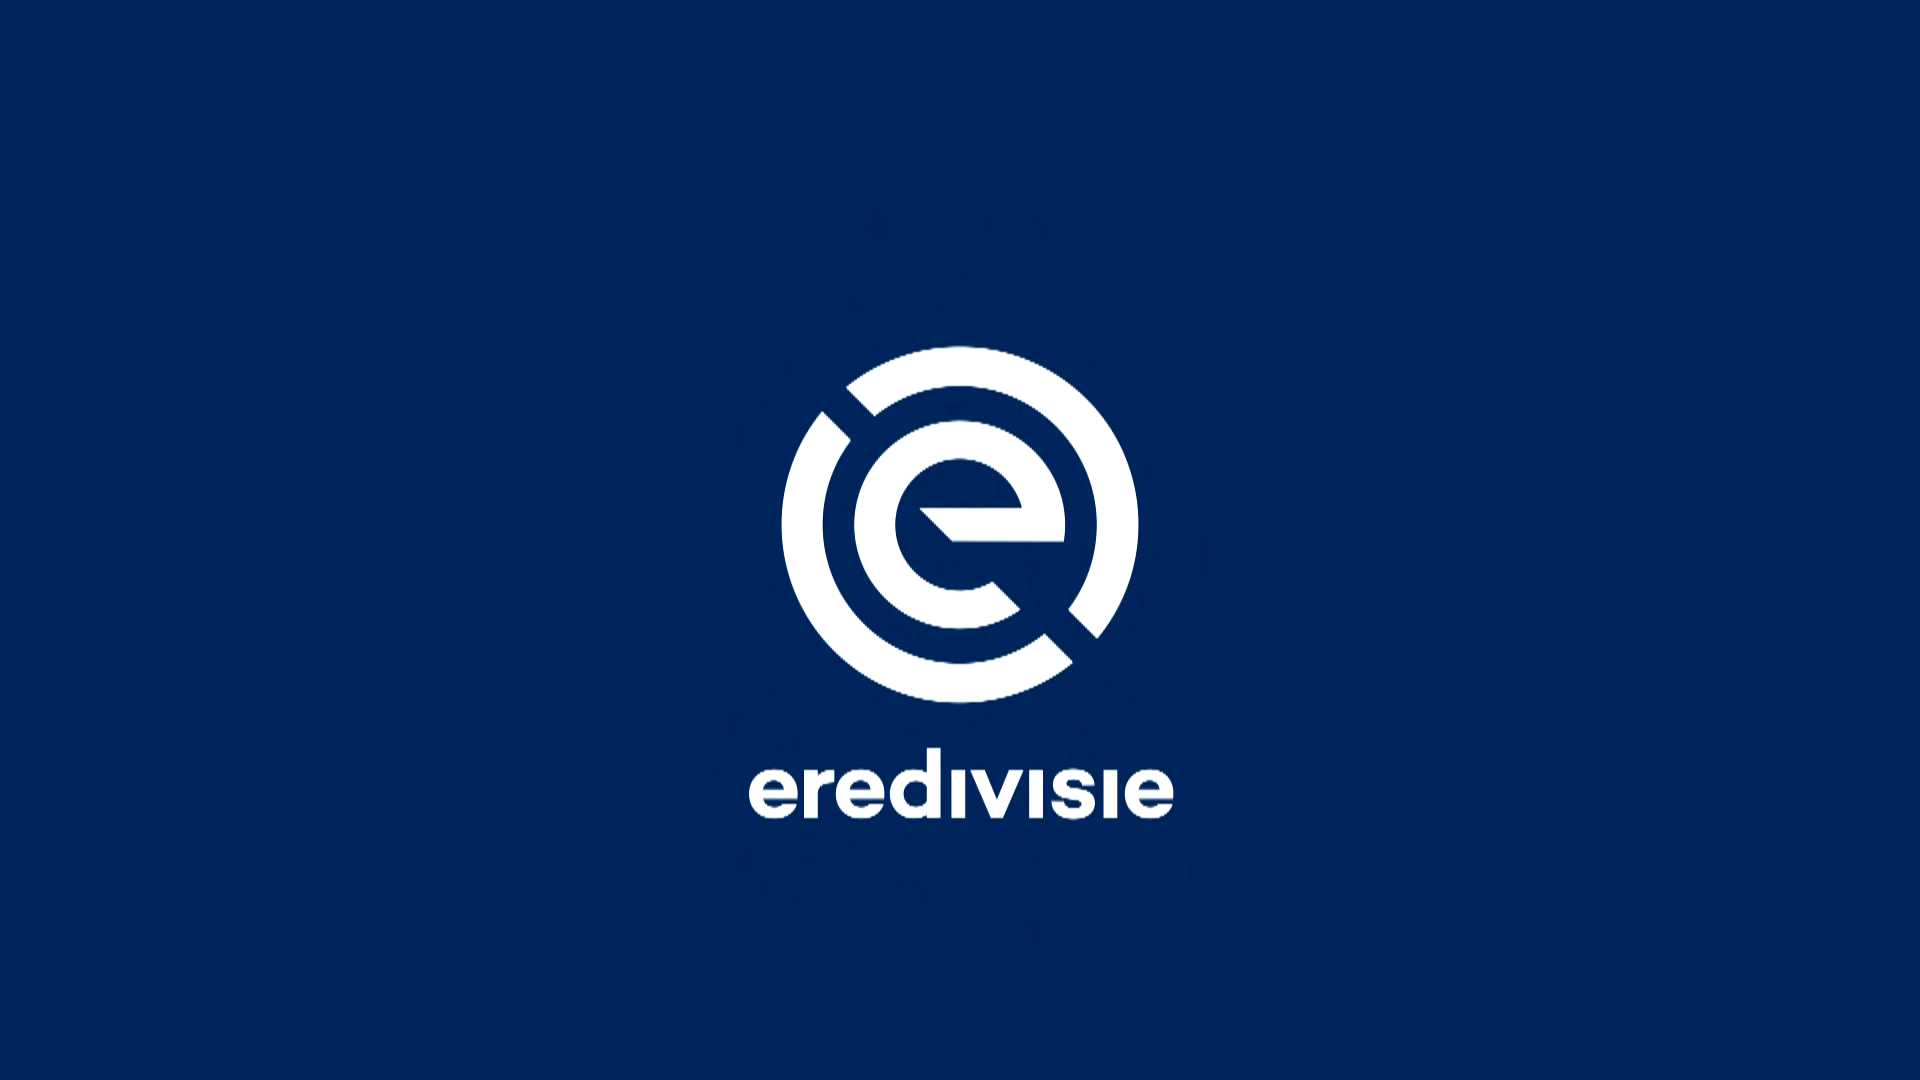 Чемпионат Нидерландов 2020/21. Обзор матчей 7 тура